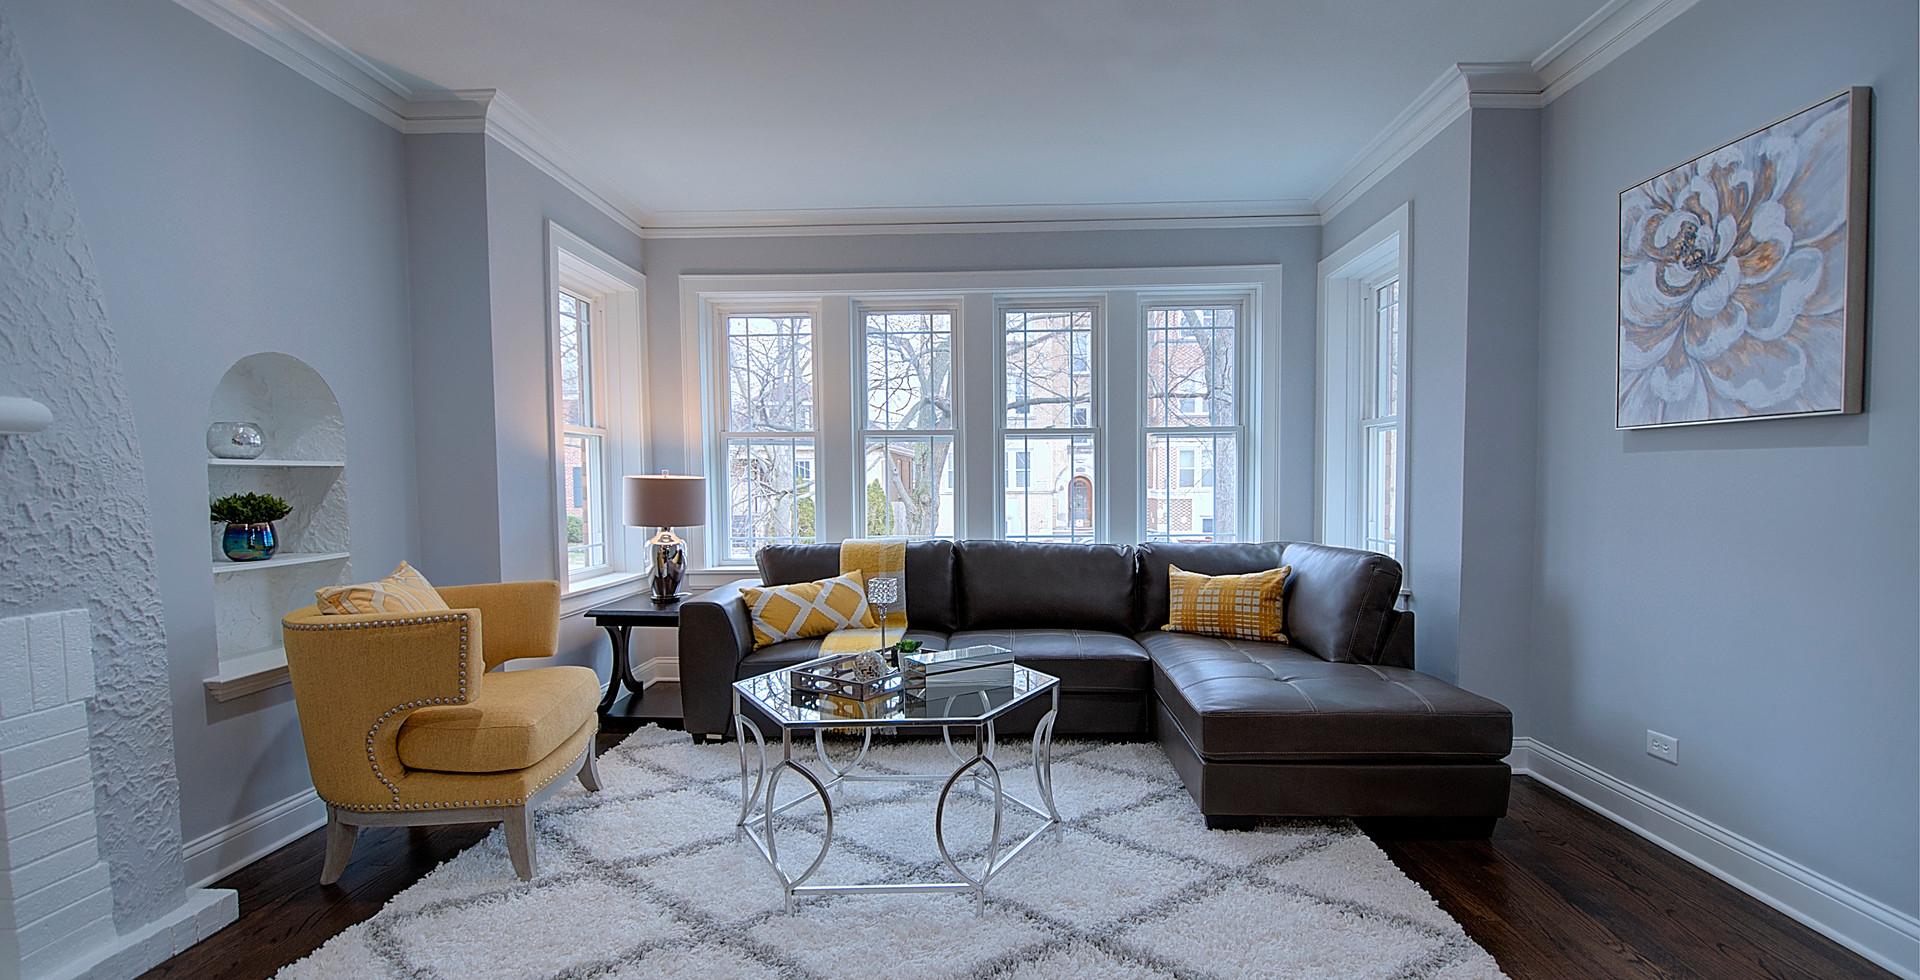 Living Room in Lake Forest designed by MRM Home Design.jpg